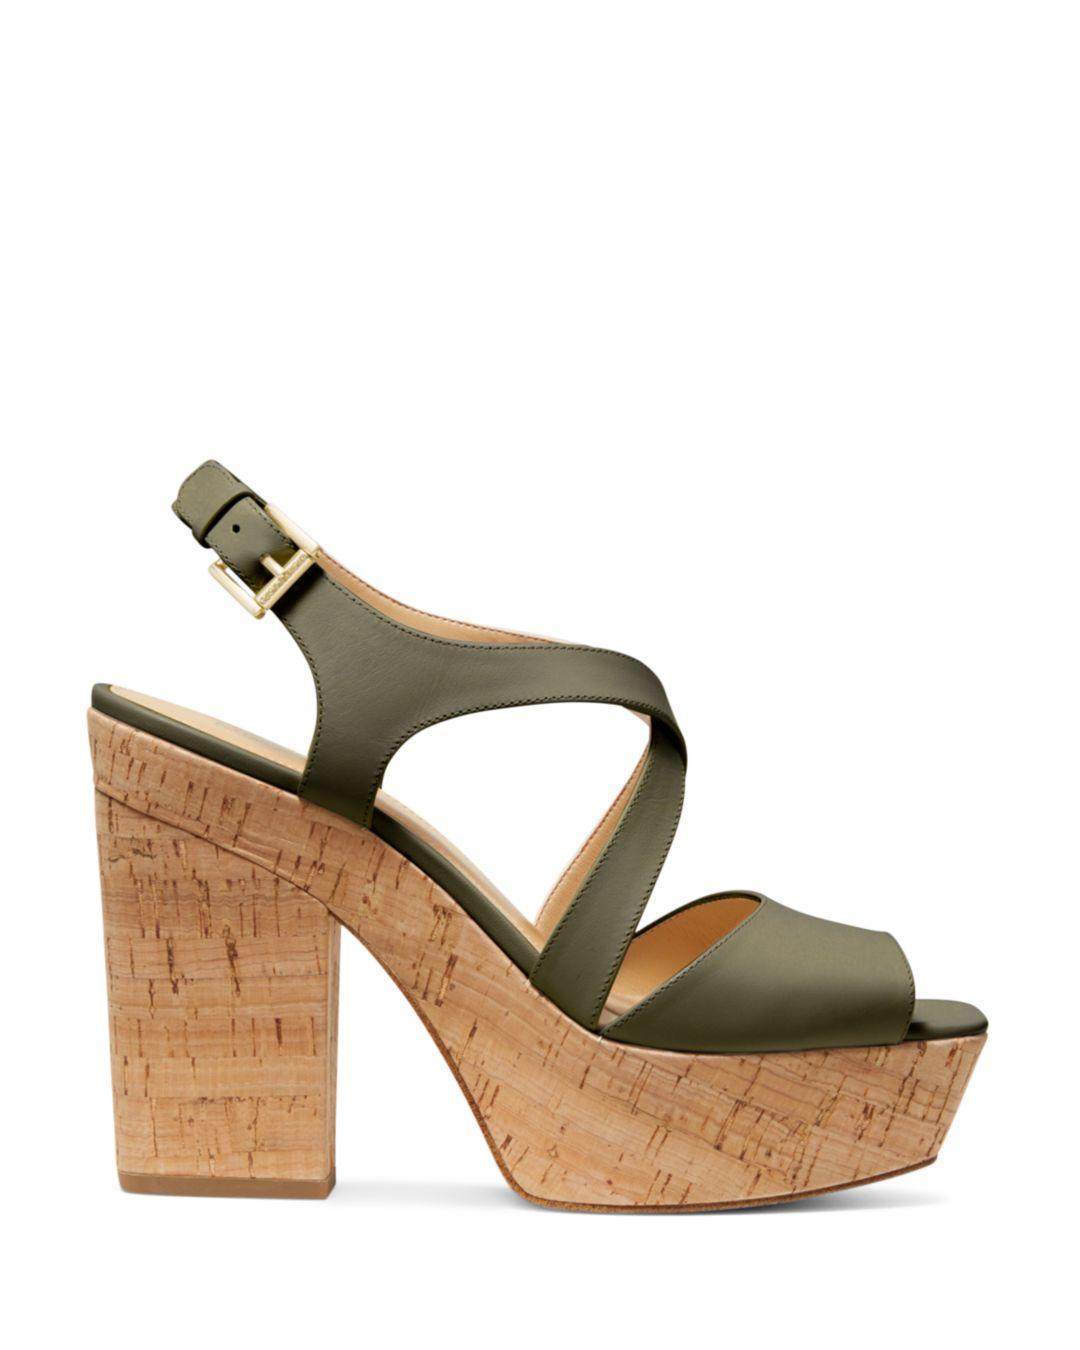 431977ce0af Lyst - MICHAEL Michael Kors Women s Abbott Leather Platform Wedge Sandals  in Green